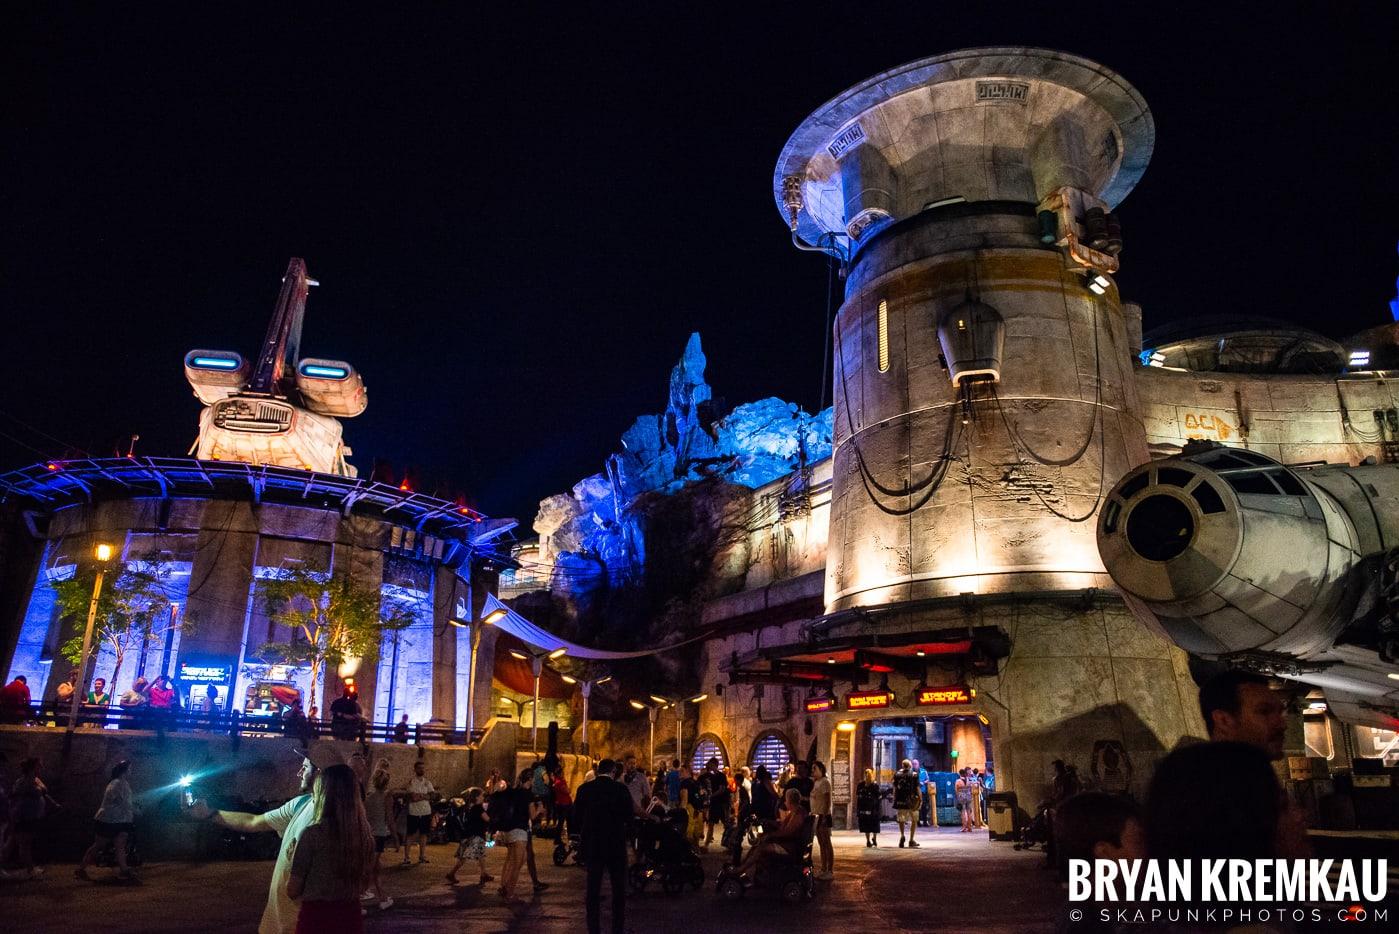 Walt Disney World Vacation: Day 5 (Animal Kingdom / Disney's Hollywood Studios) - 10.3.19 (18)